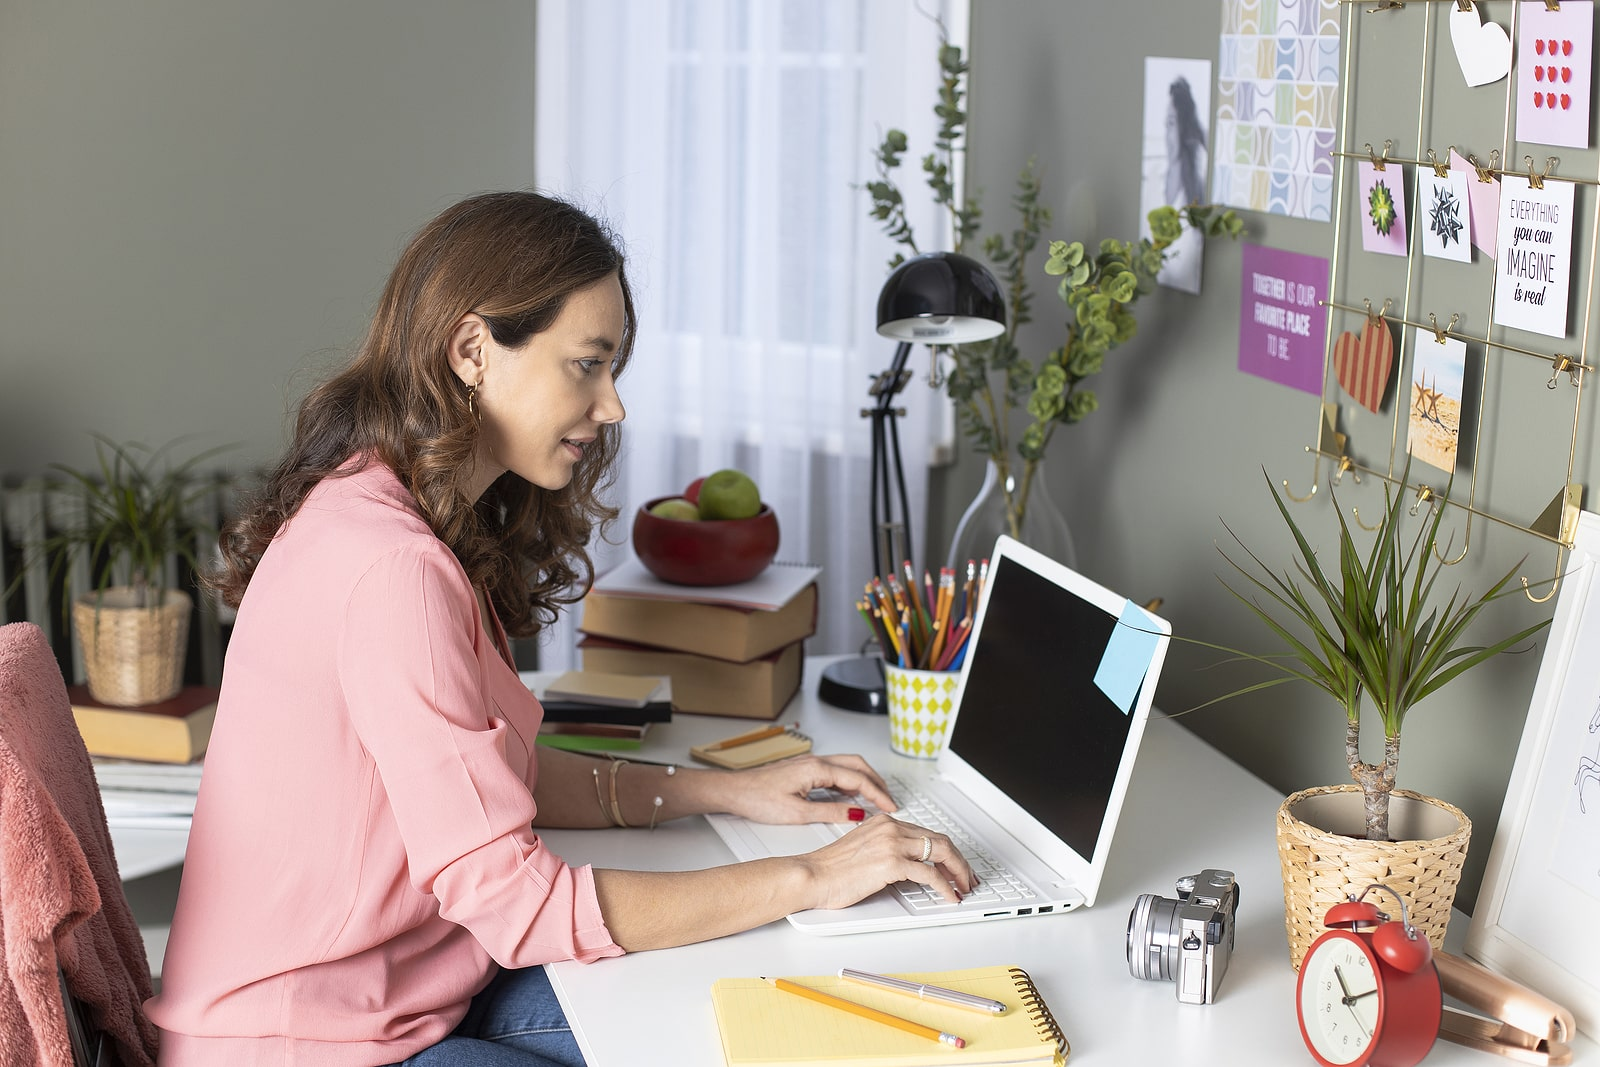 bigstock-Woman-Working-From-Home-Freel-347037988-min